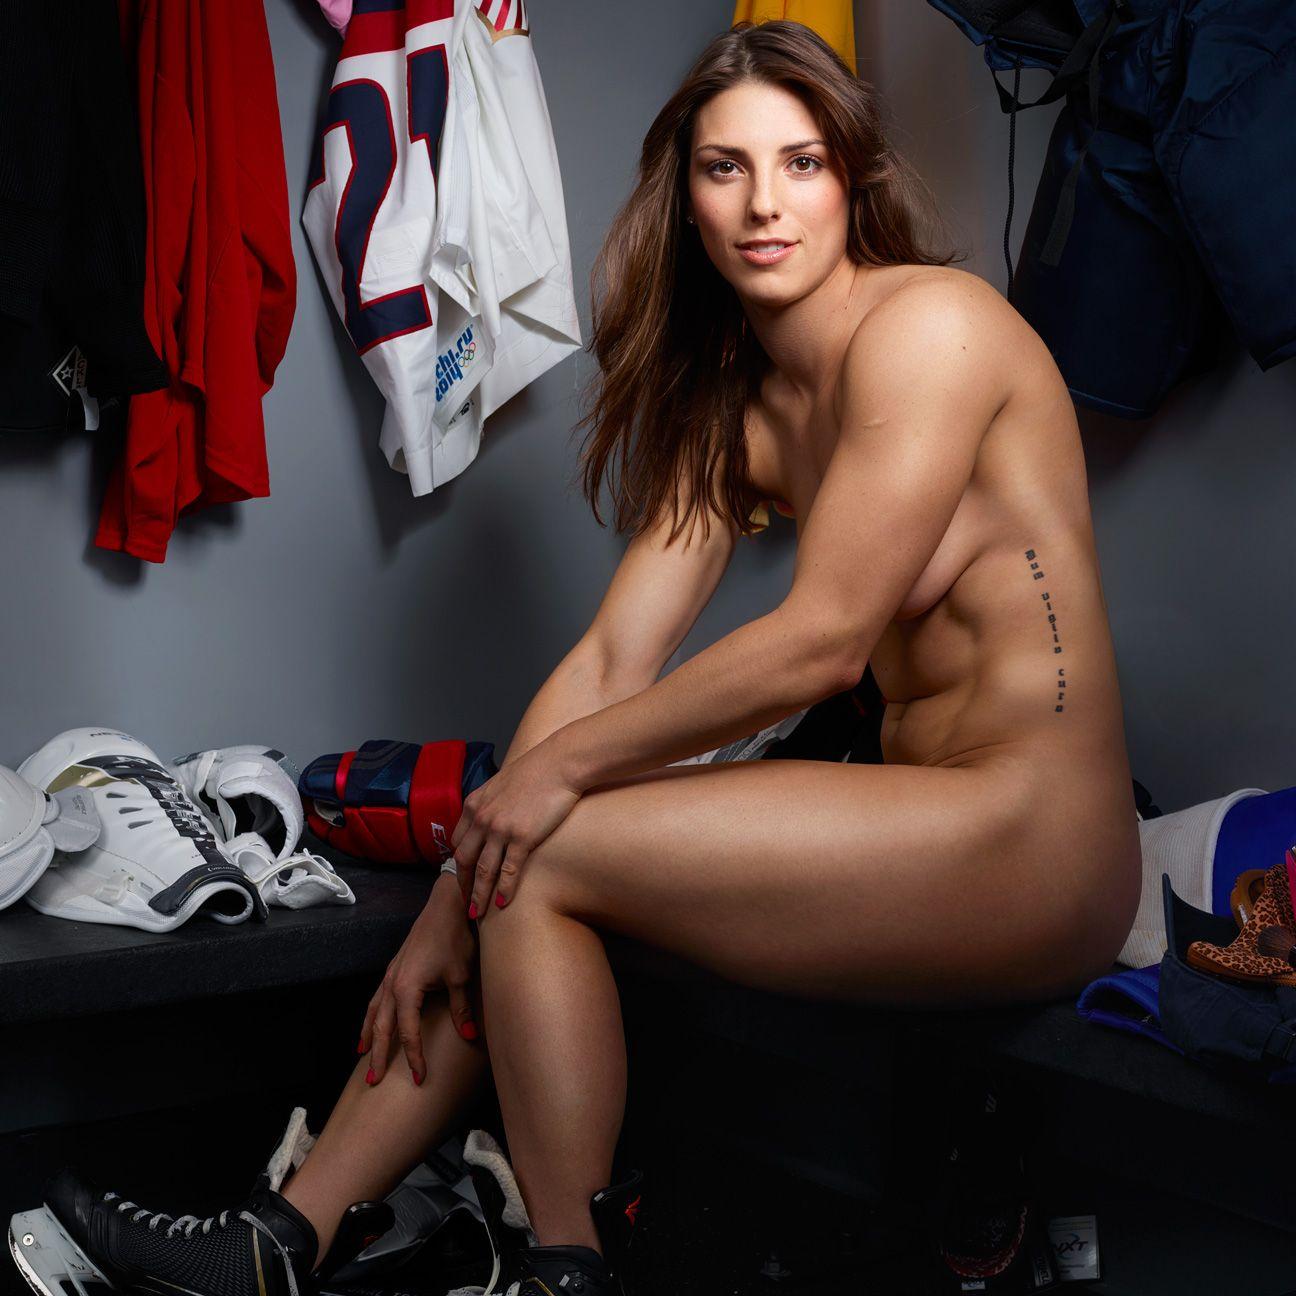 Espn Women Nude